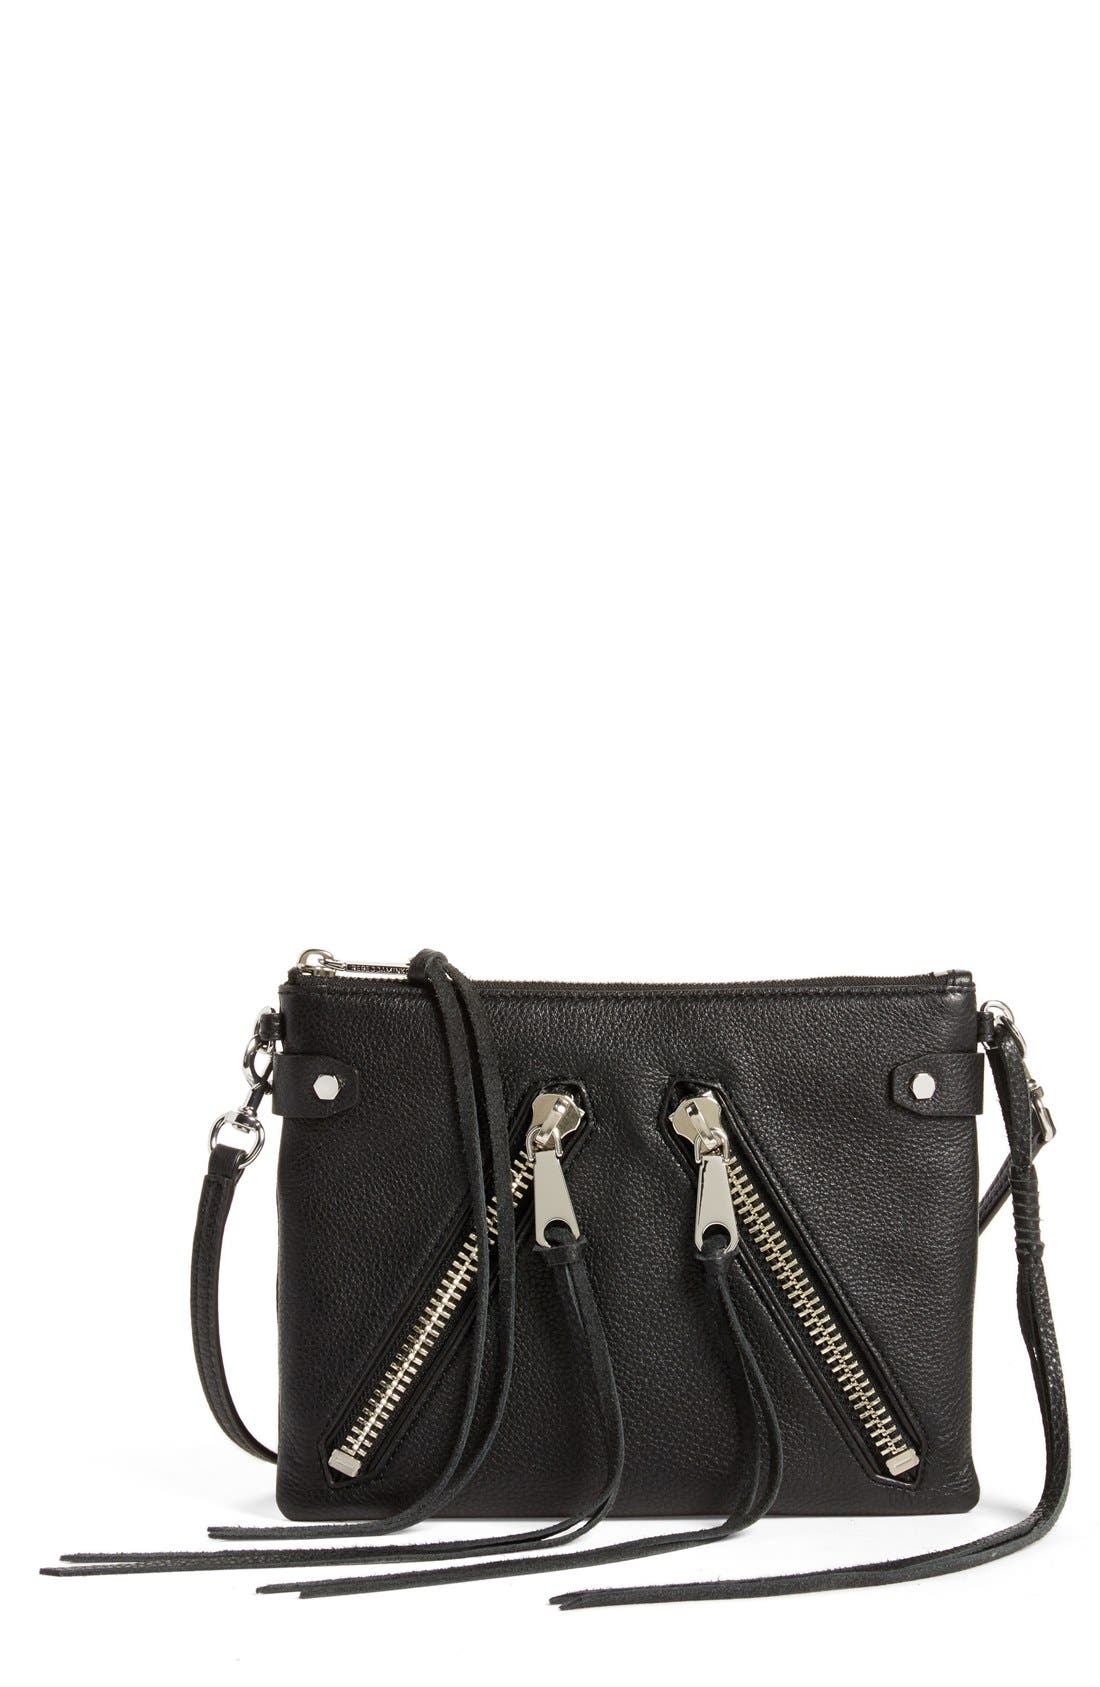 'Moto Jon' Leather Crossbody Bag,                             Main thumbnail 1, color,                             001